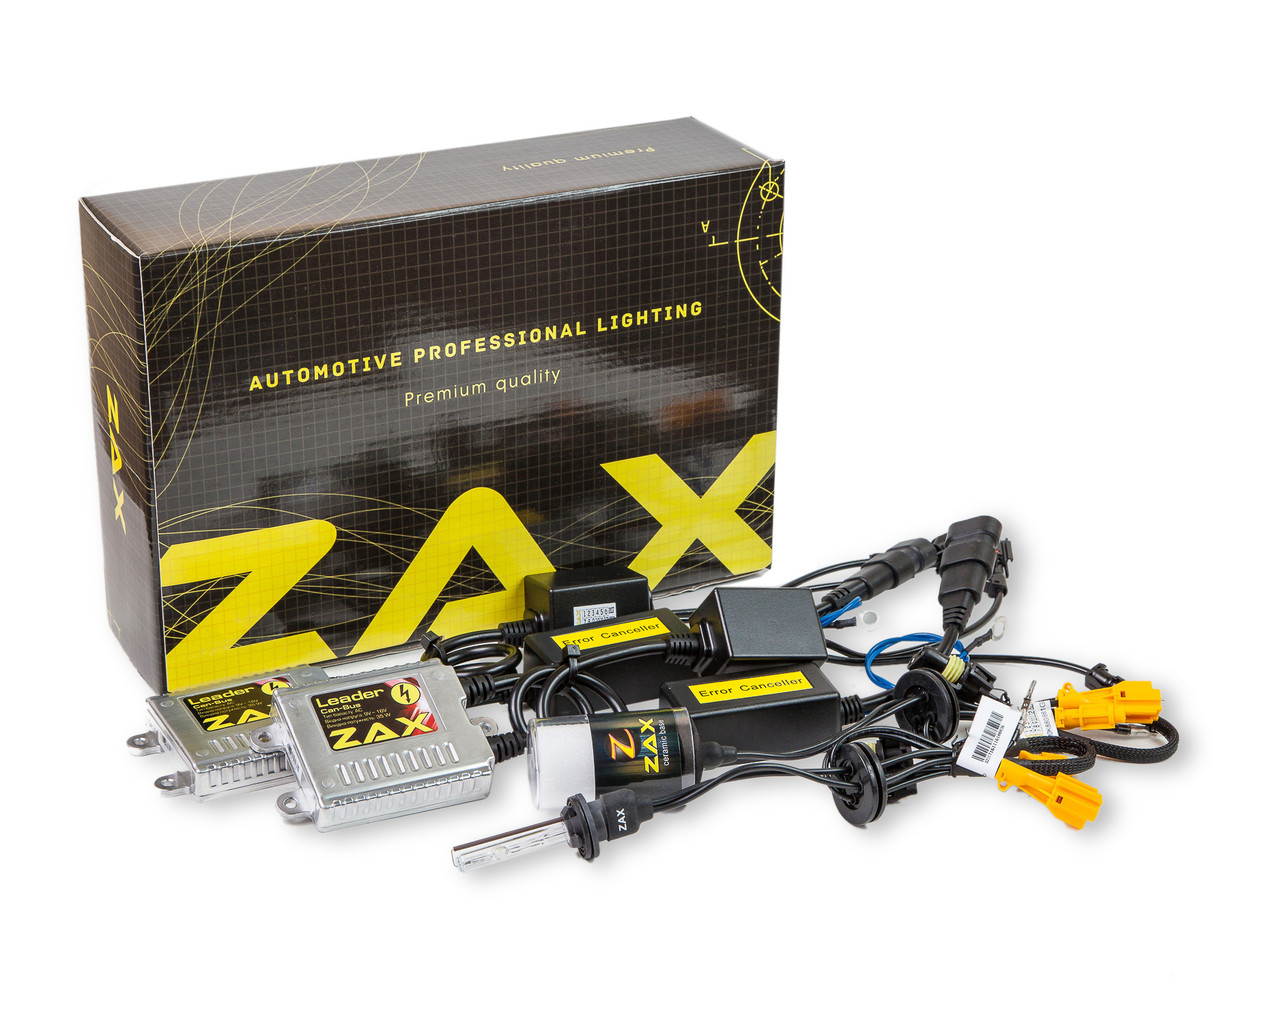 Комплект ксенона ZAX Leader Can-Bus 35W 9-16V H27 (880/881) Ceramic 4300K